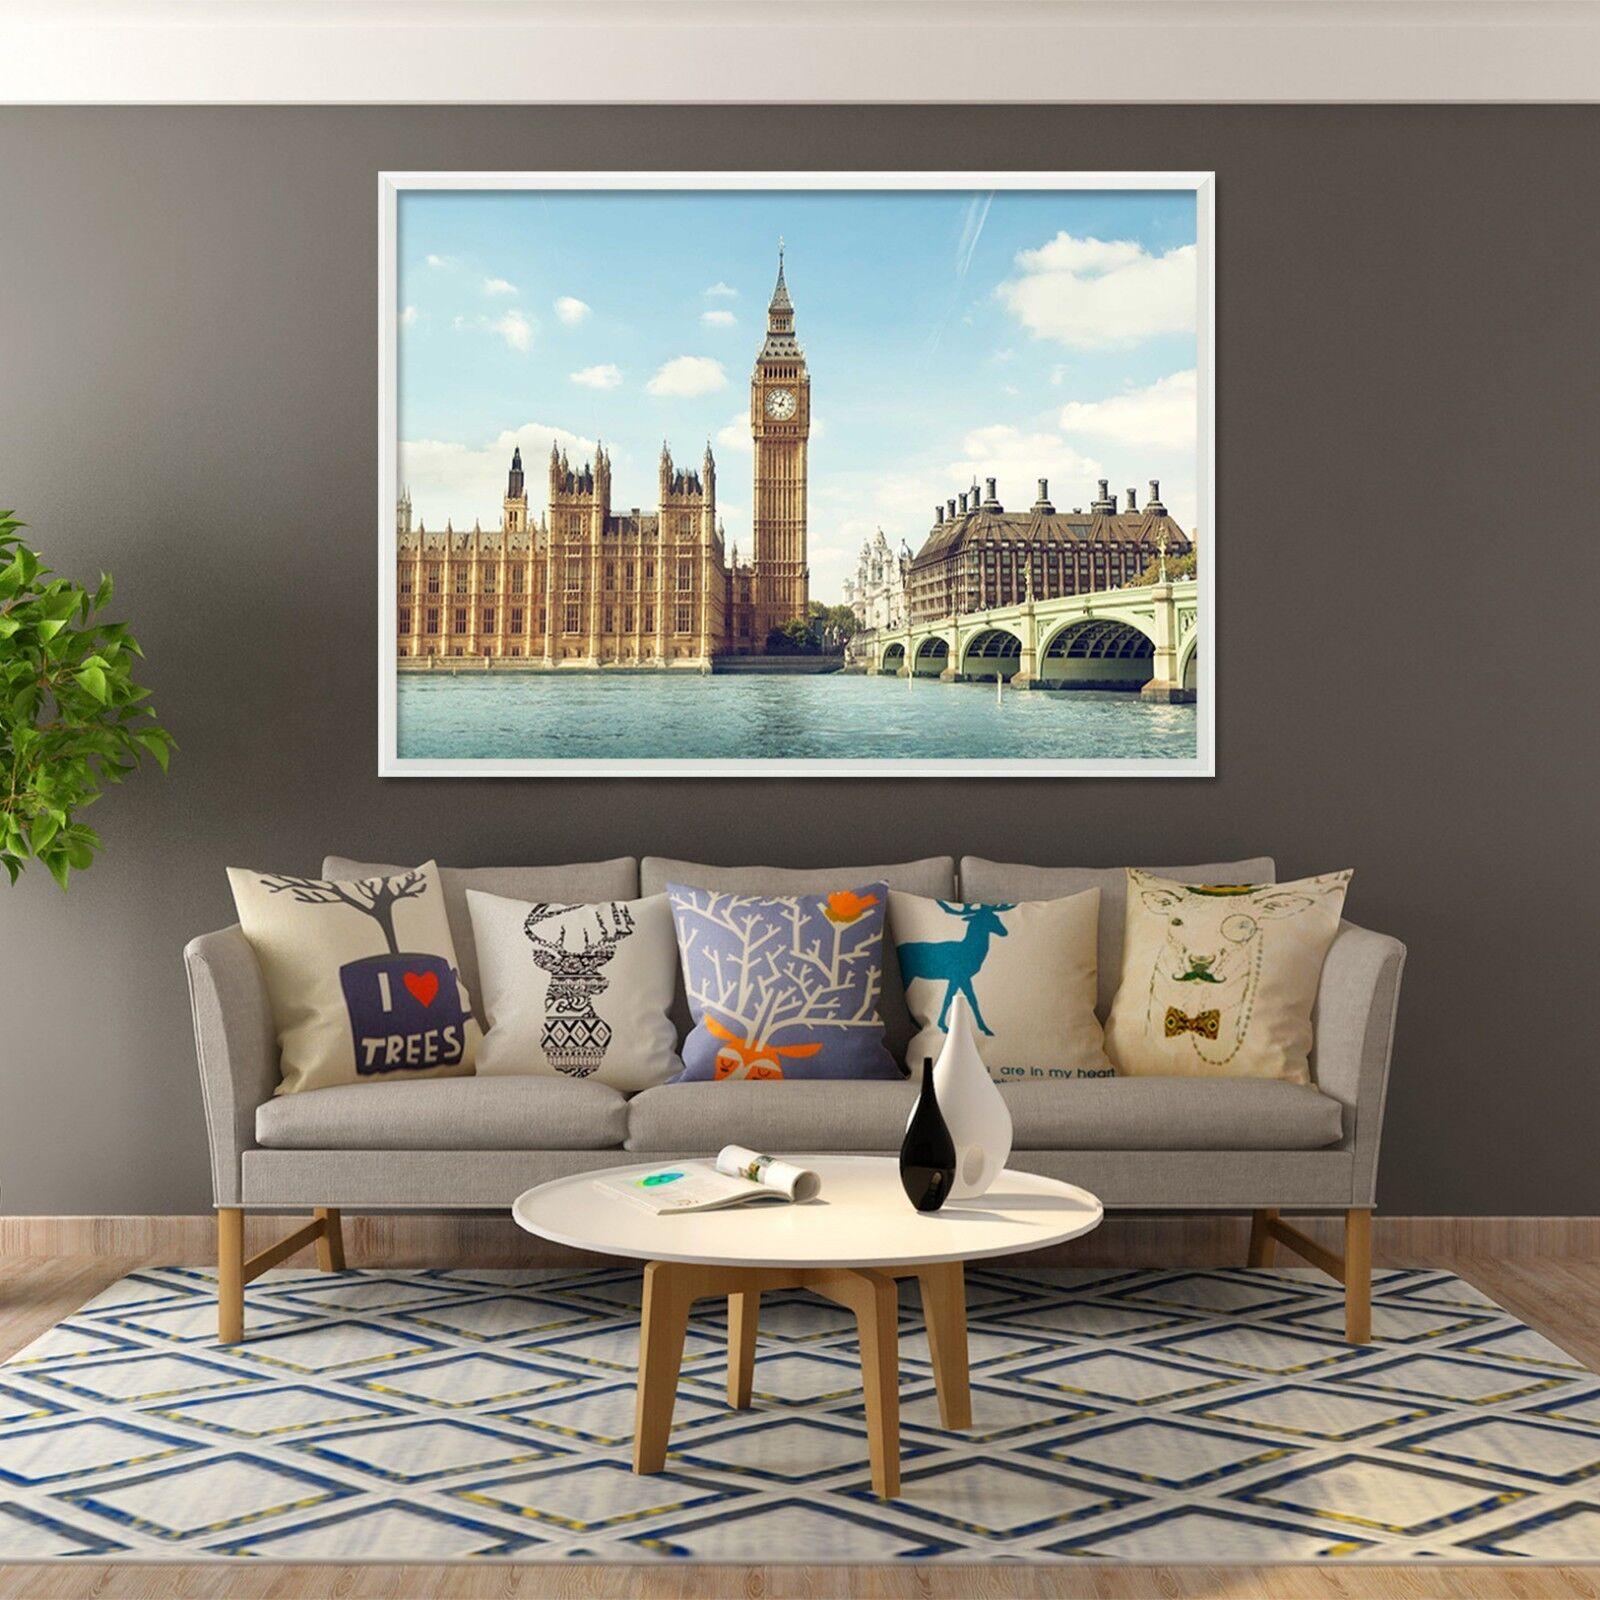 3D Big Ben 664 Fake Framed Poster Home Decor Print Painting Unique Art Summer